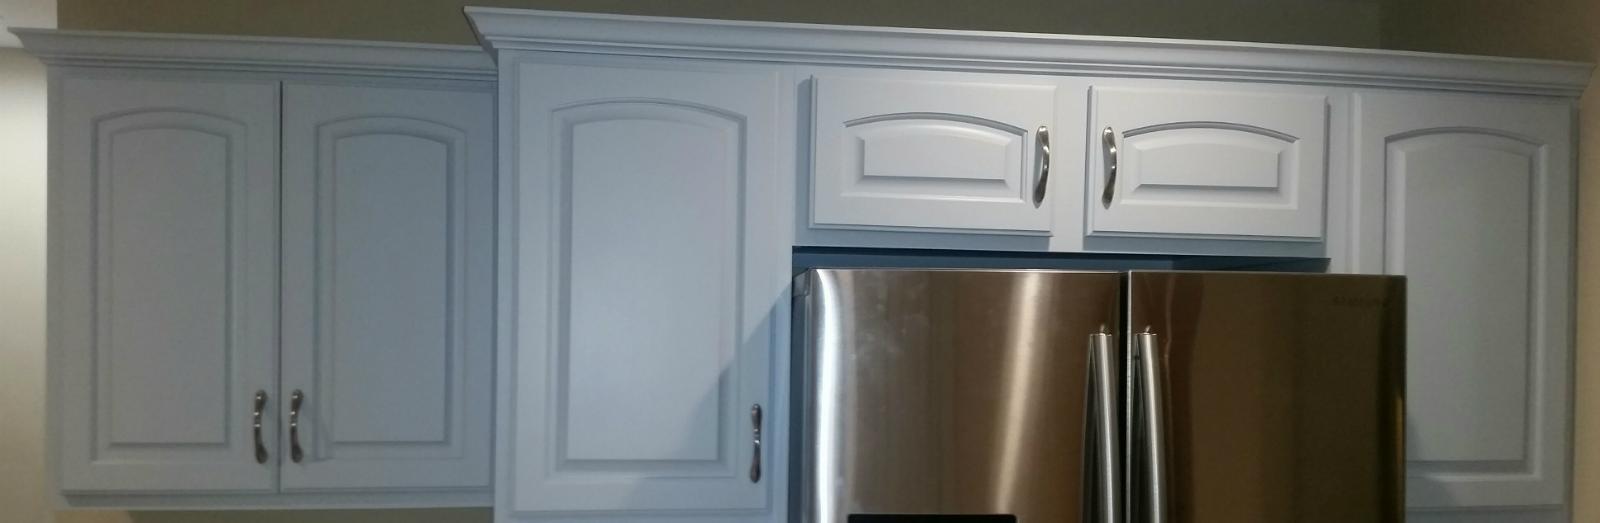 Professional Kitchen Cabinet Painters - Nagpurentrepreneurs